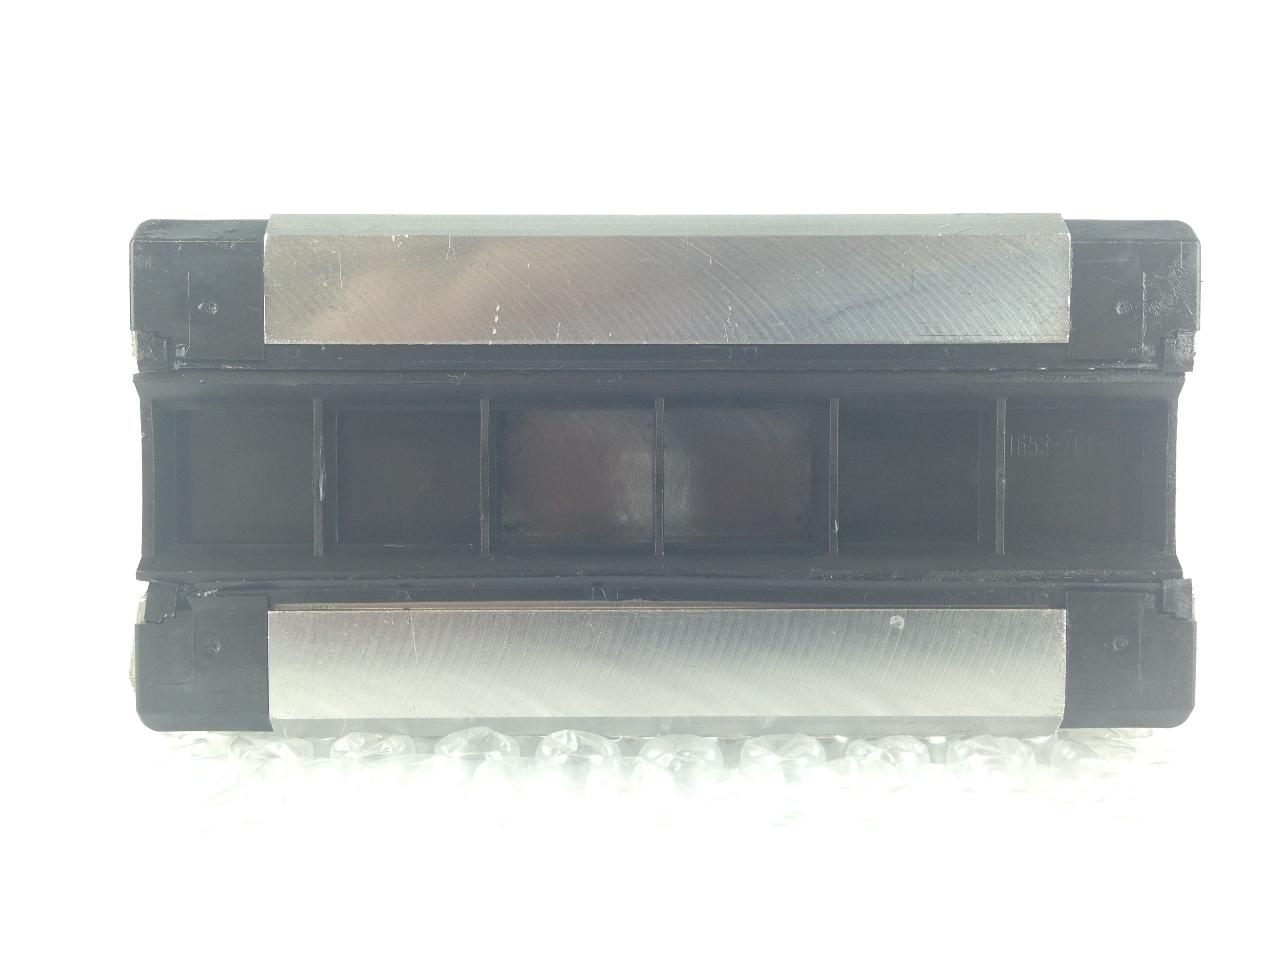 Rexroth R162371320 Runner Block Linear Bearing